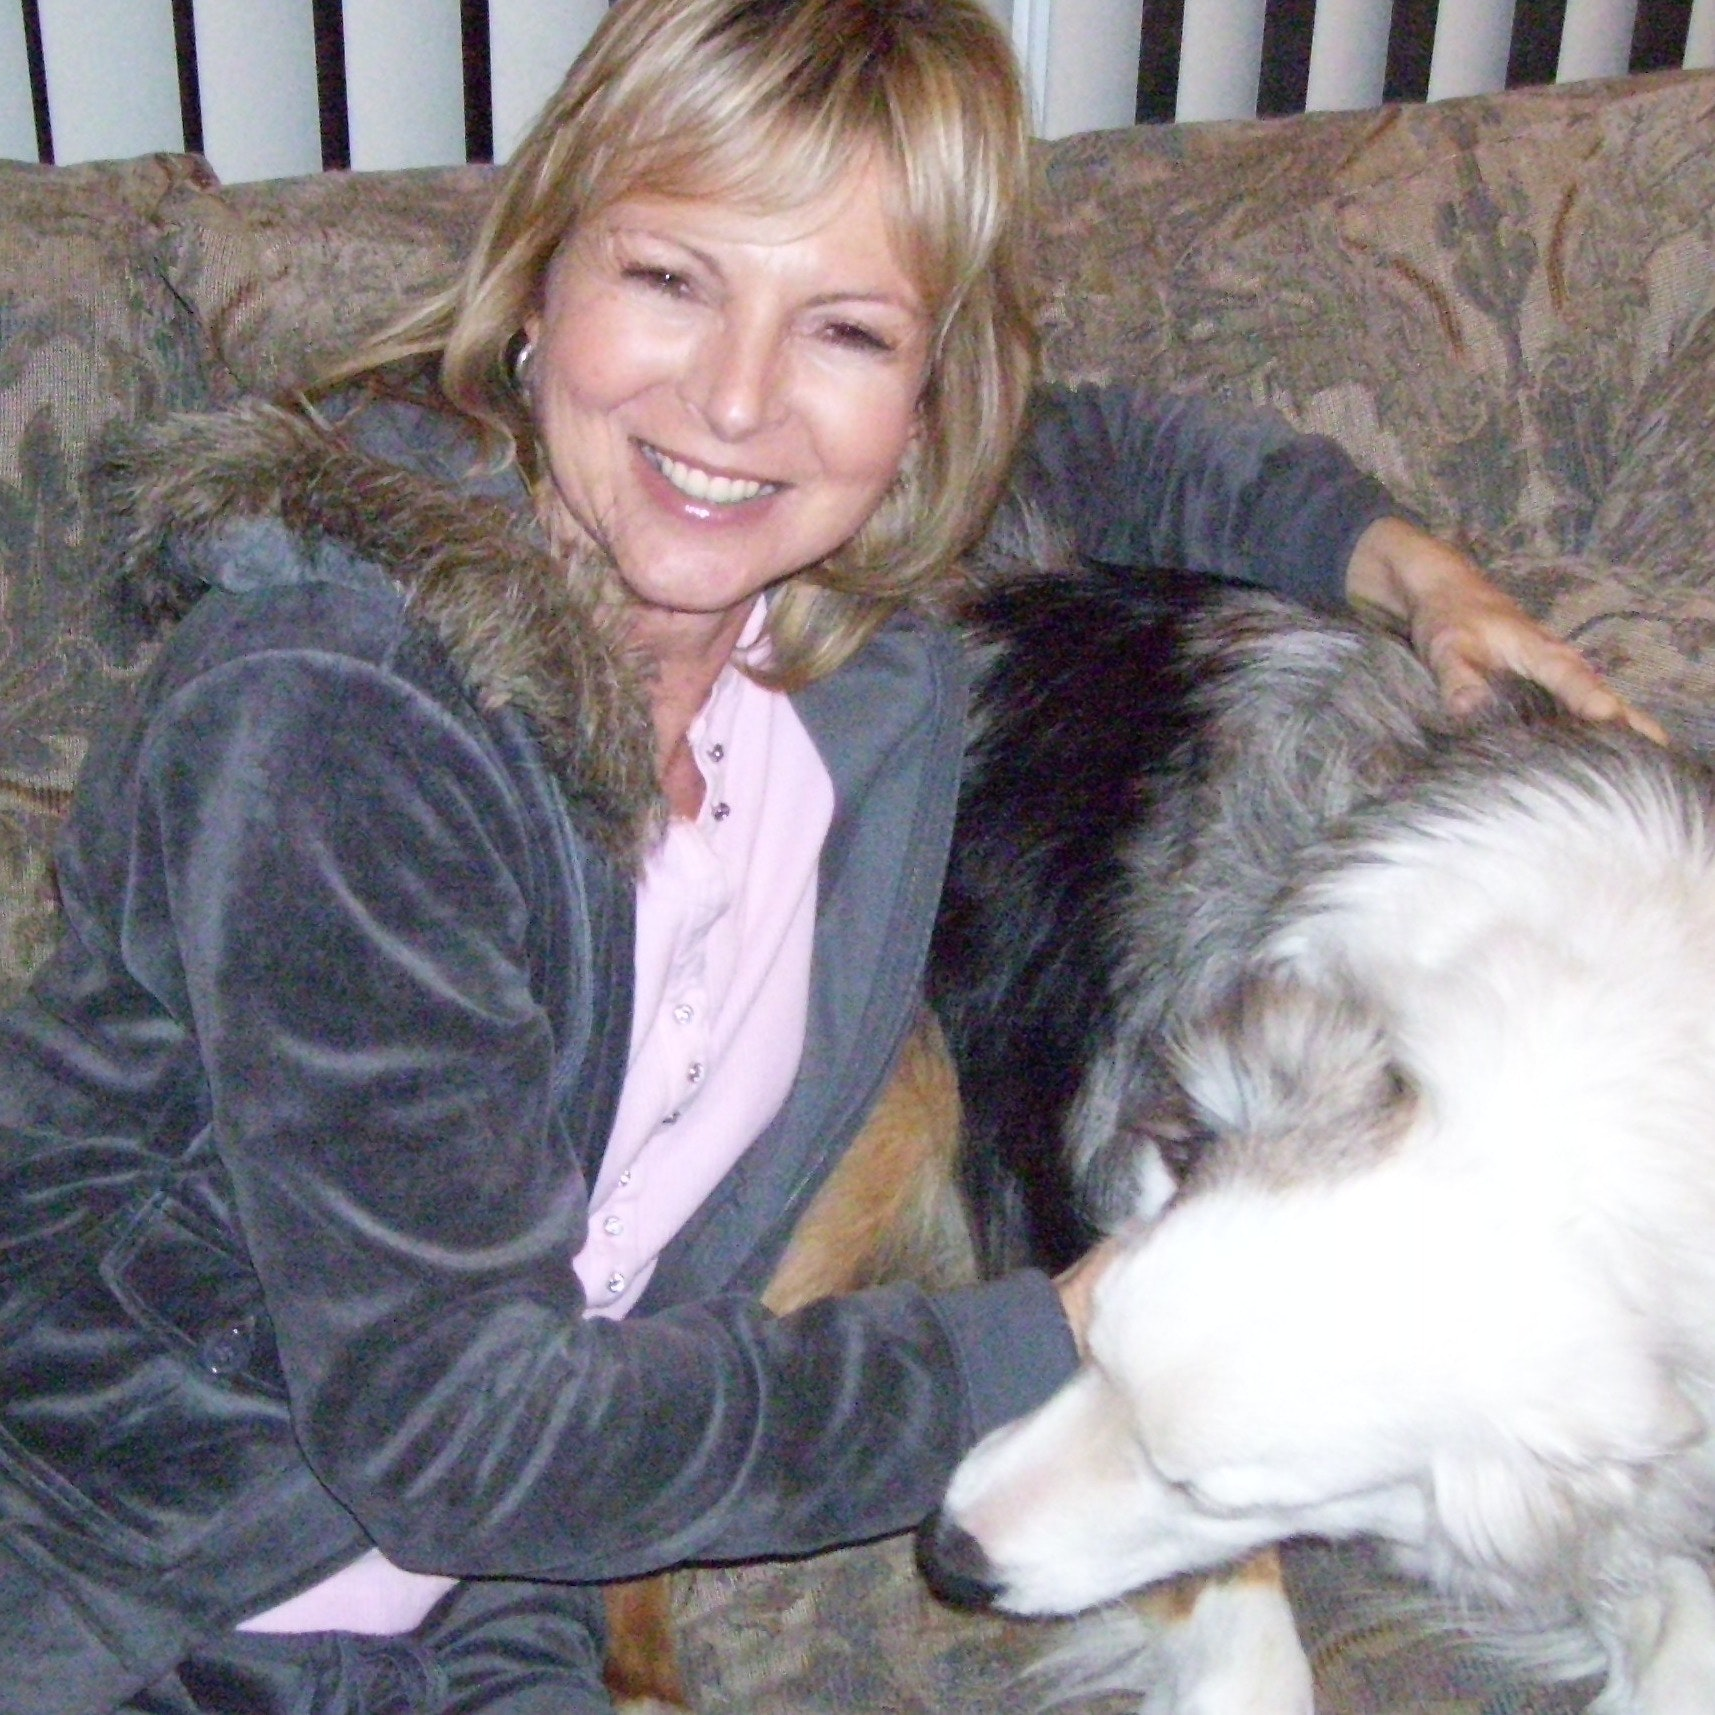 Kimberley's dog day care